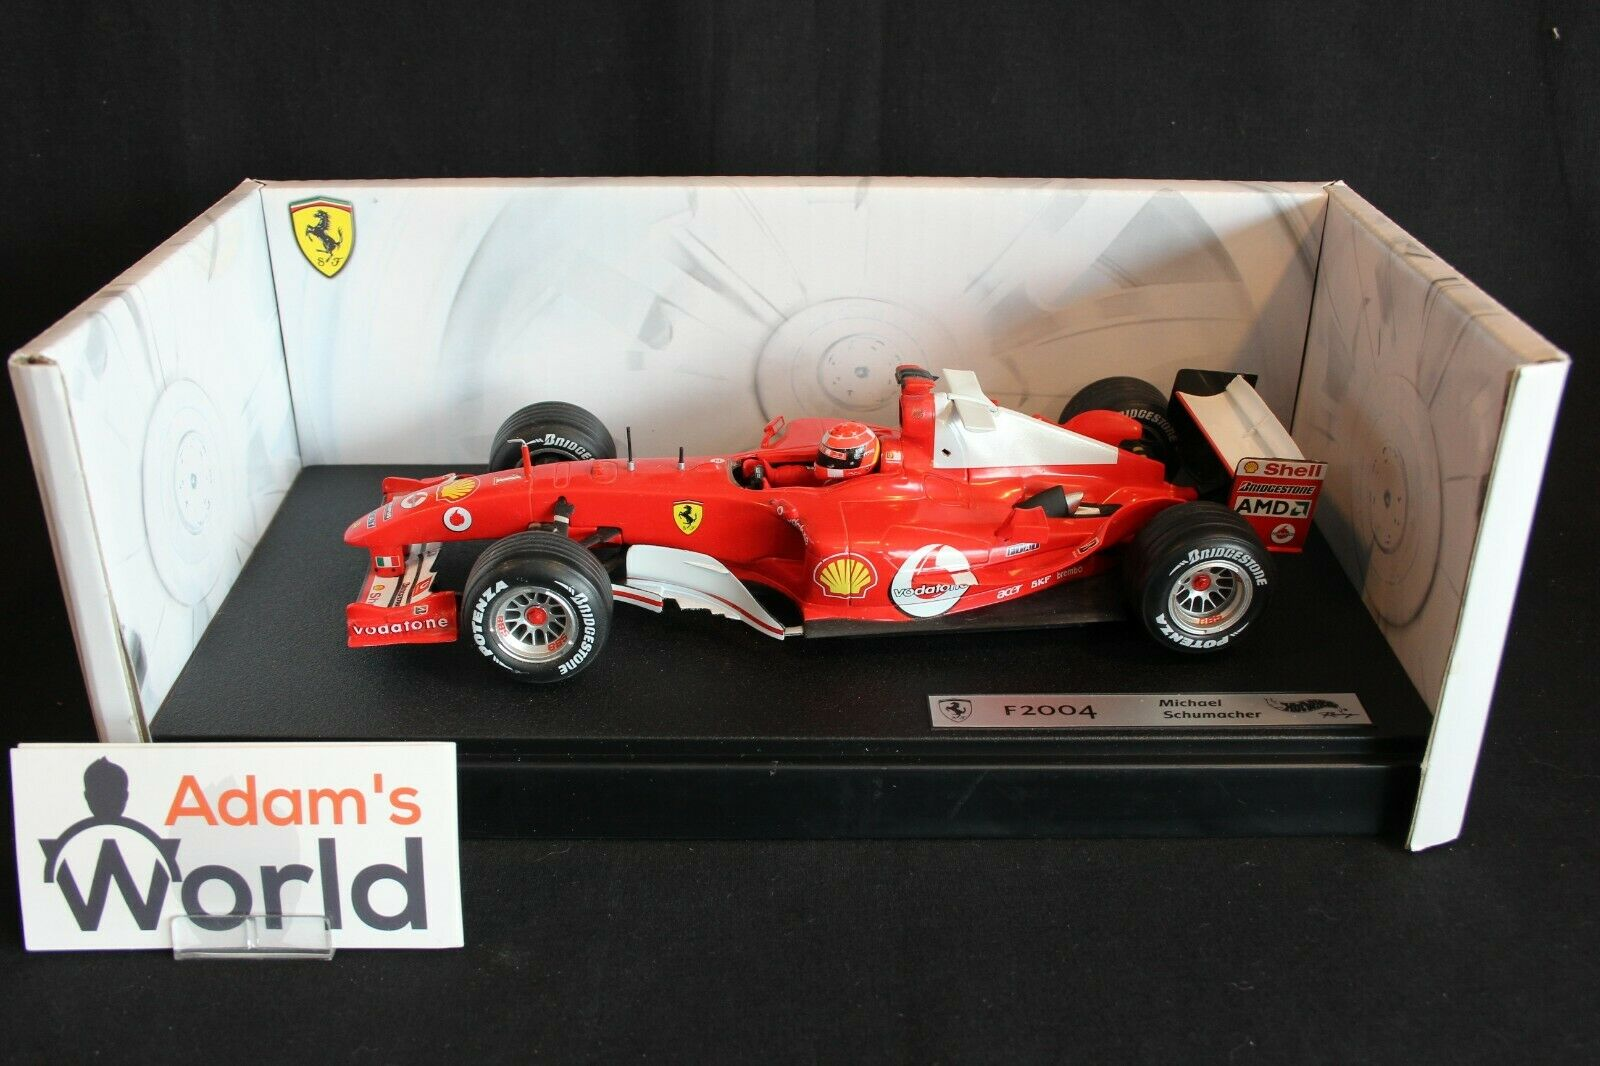 Hot Wheels Ferrari F2004 2004 1 18 Michael Schumacher (GER) (PJBB)